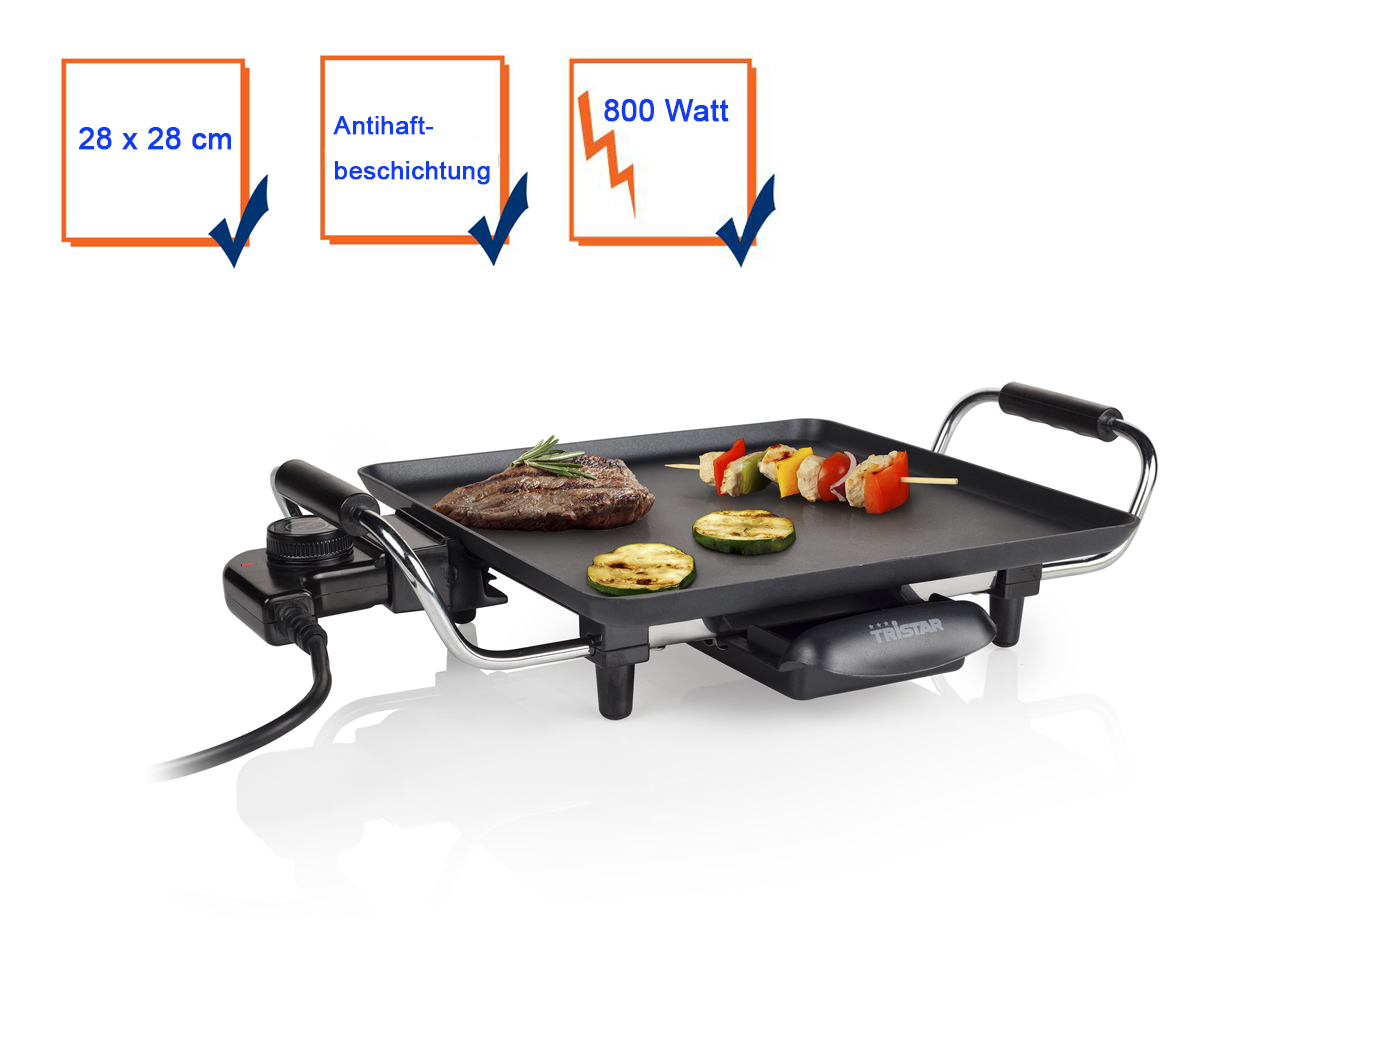 XL Grill elektrischer Tischgrill Grillplatte Elektrogrill Teppan Yakigrill